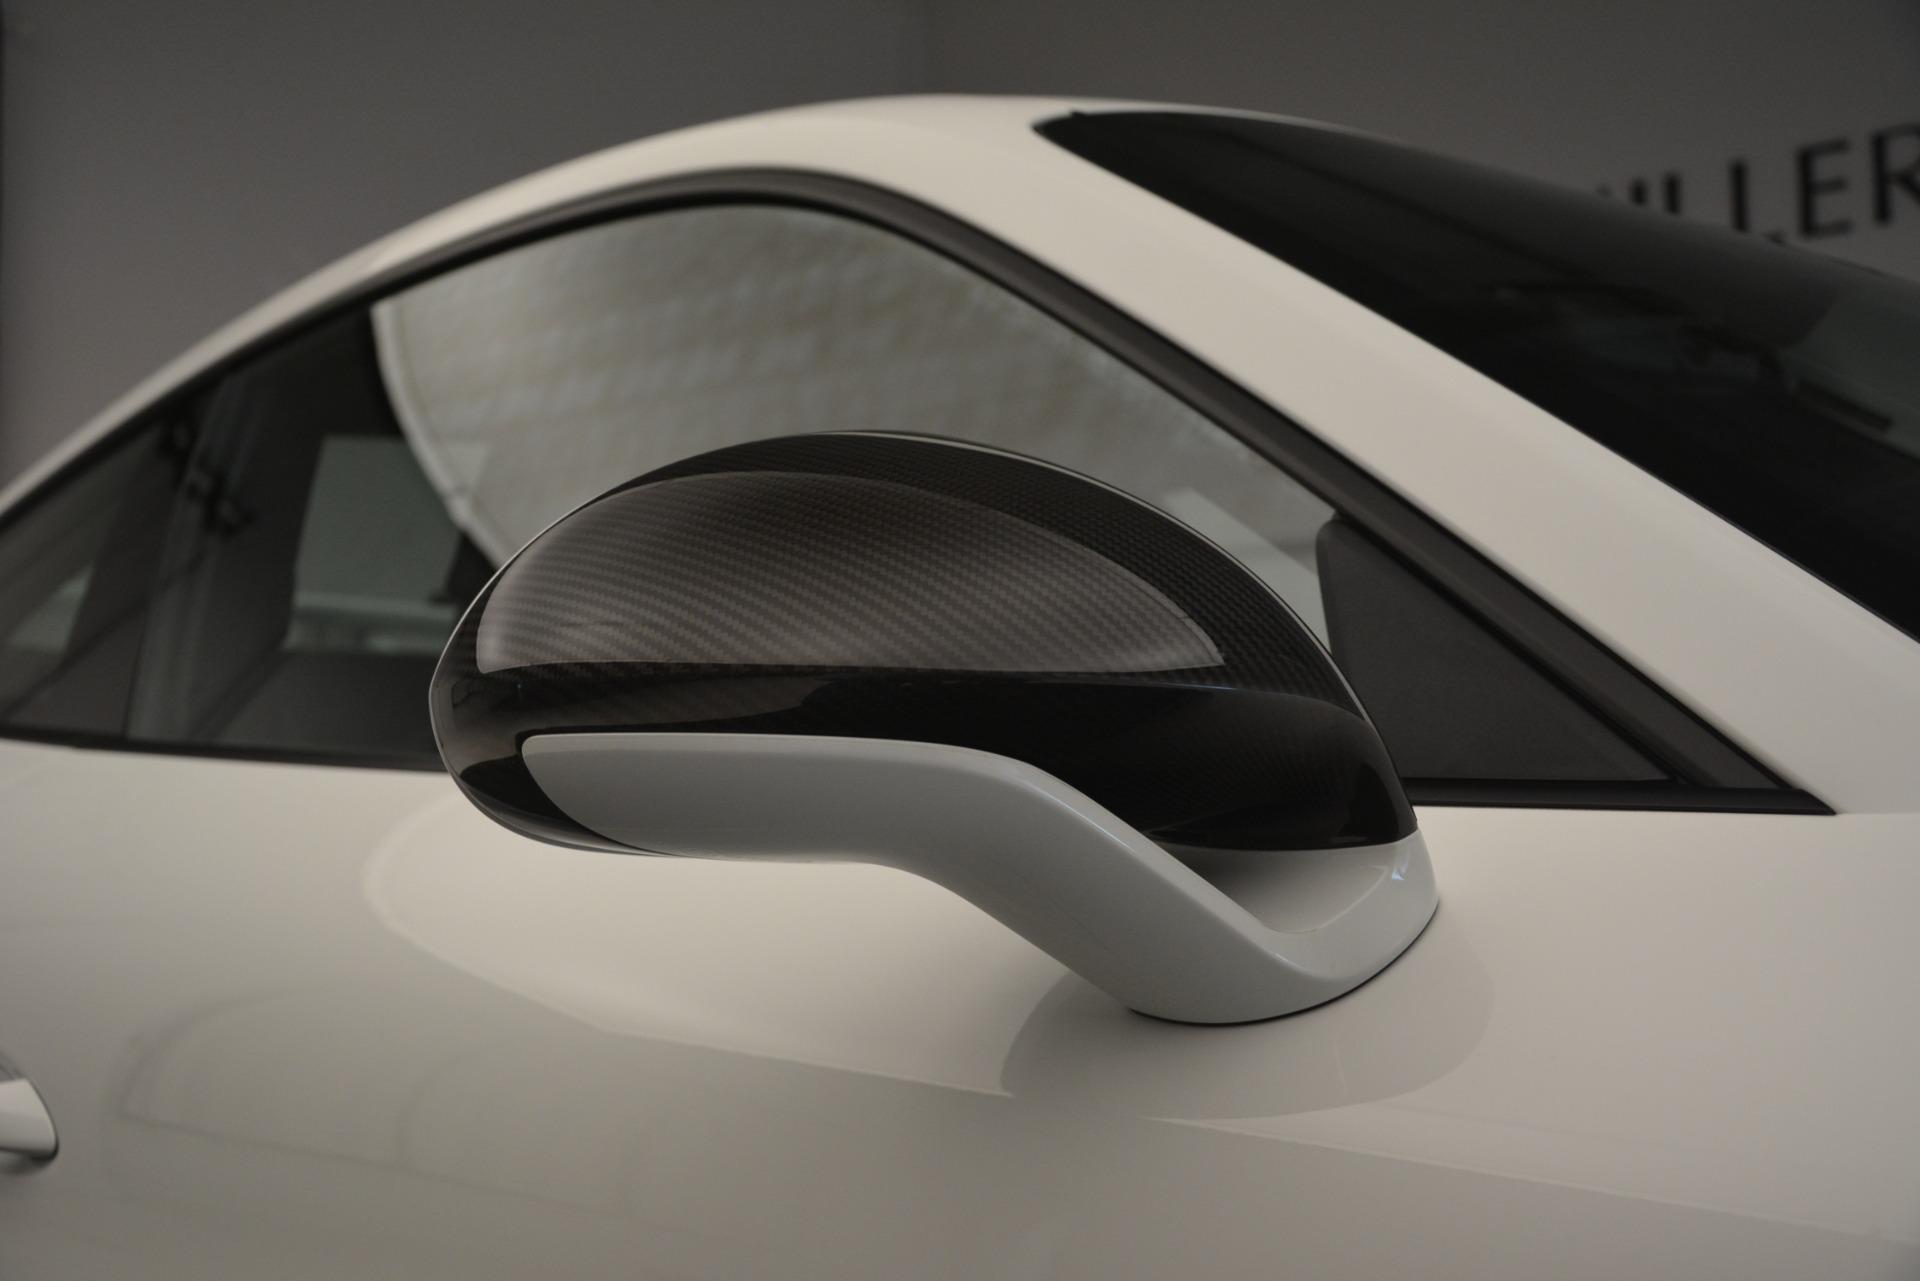 Used 2018 Porsche 911 GT3 For Sale In Greenwich, CT. Alfa Romeo of Greenwich, 7559 3176_p8